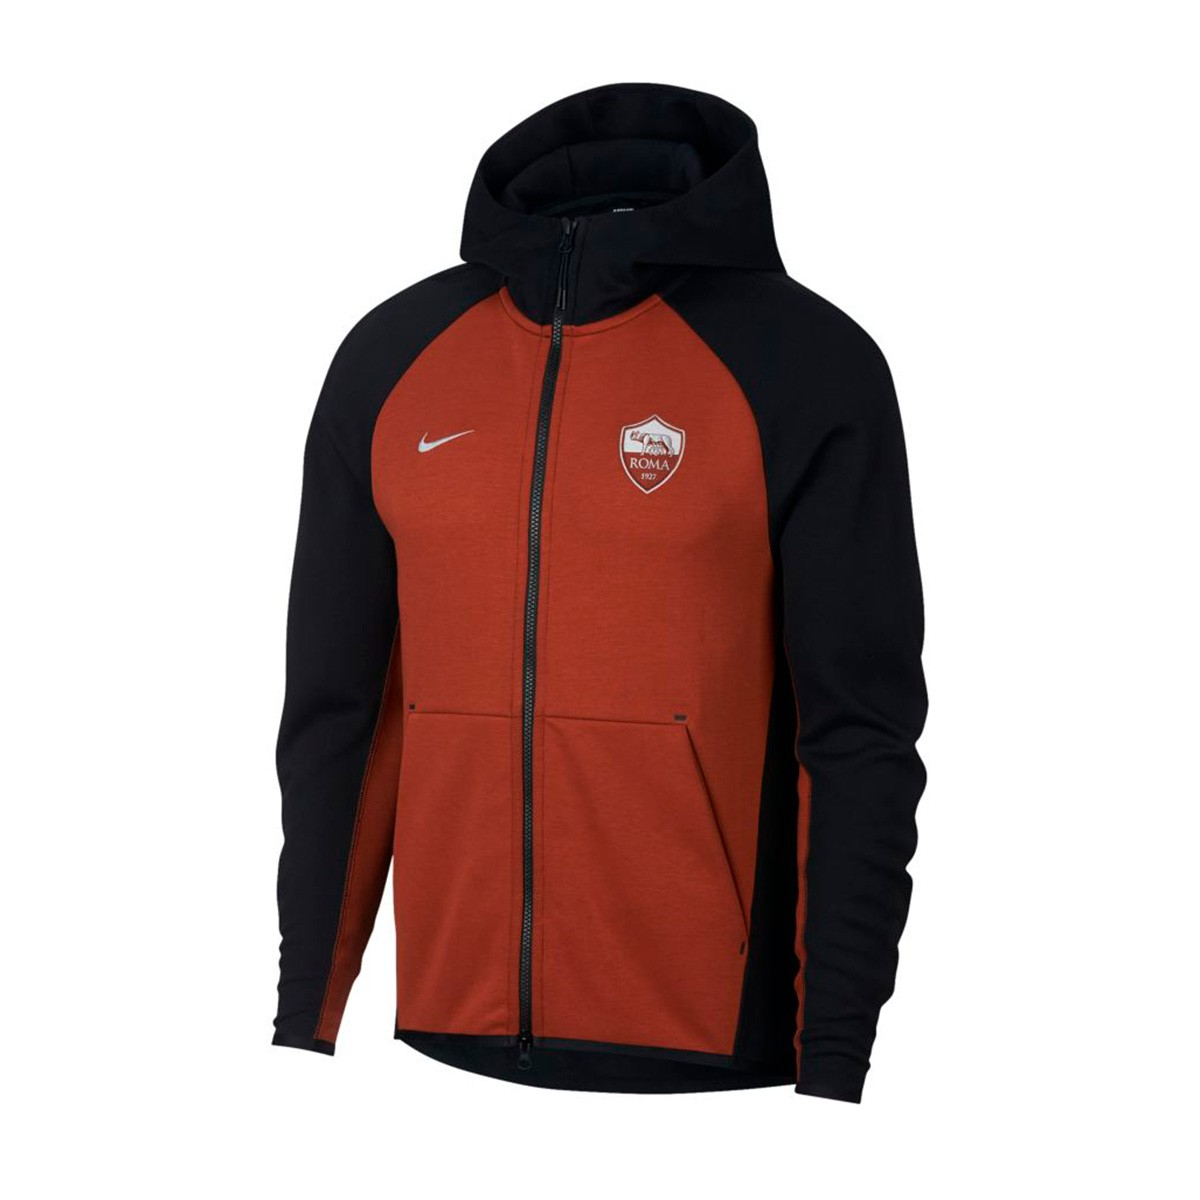 low priced c93e2 cb4f9 Nike AS Roma Tech Fleece 2018-2019 Jacket